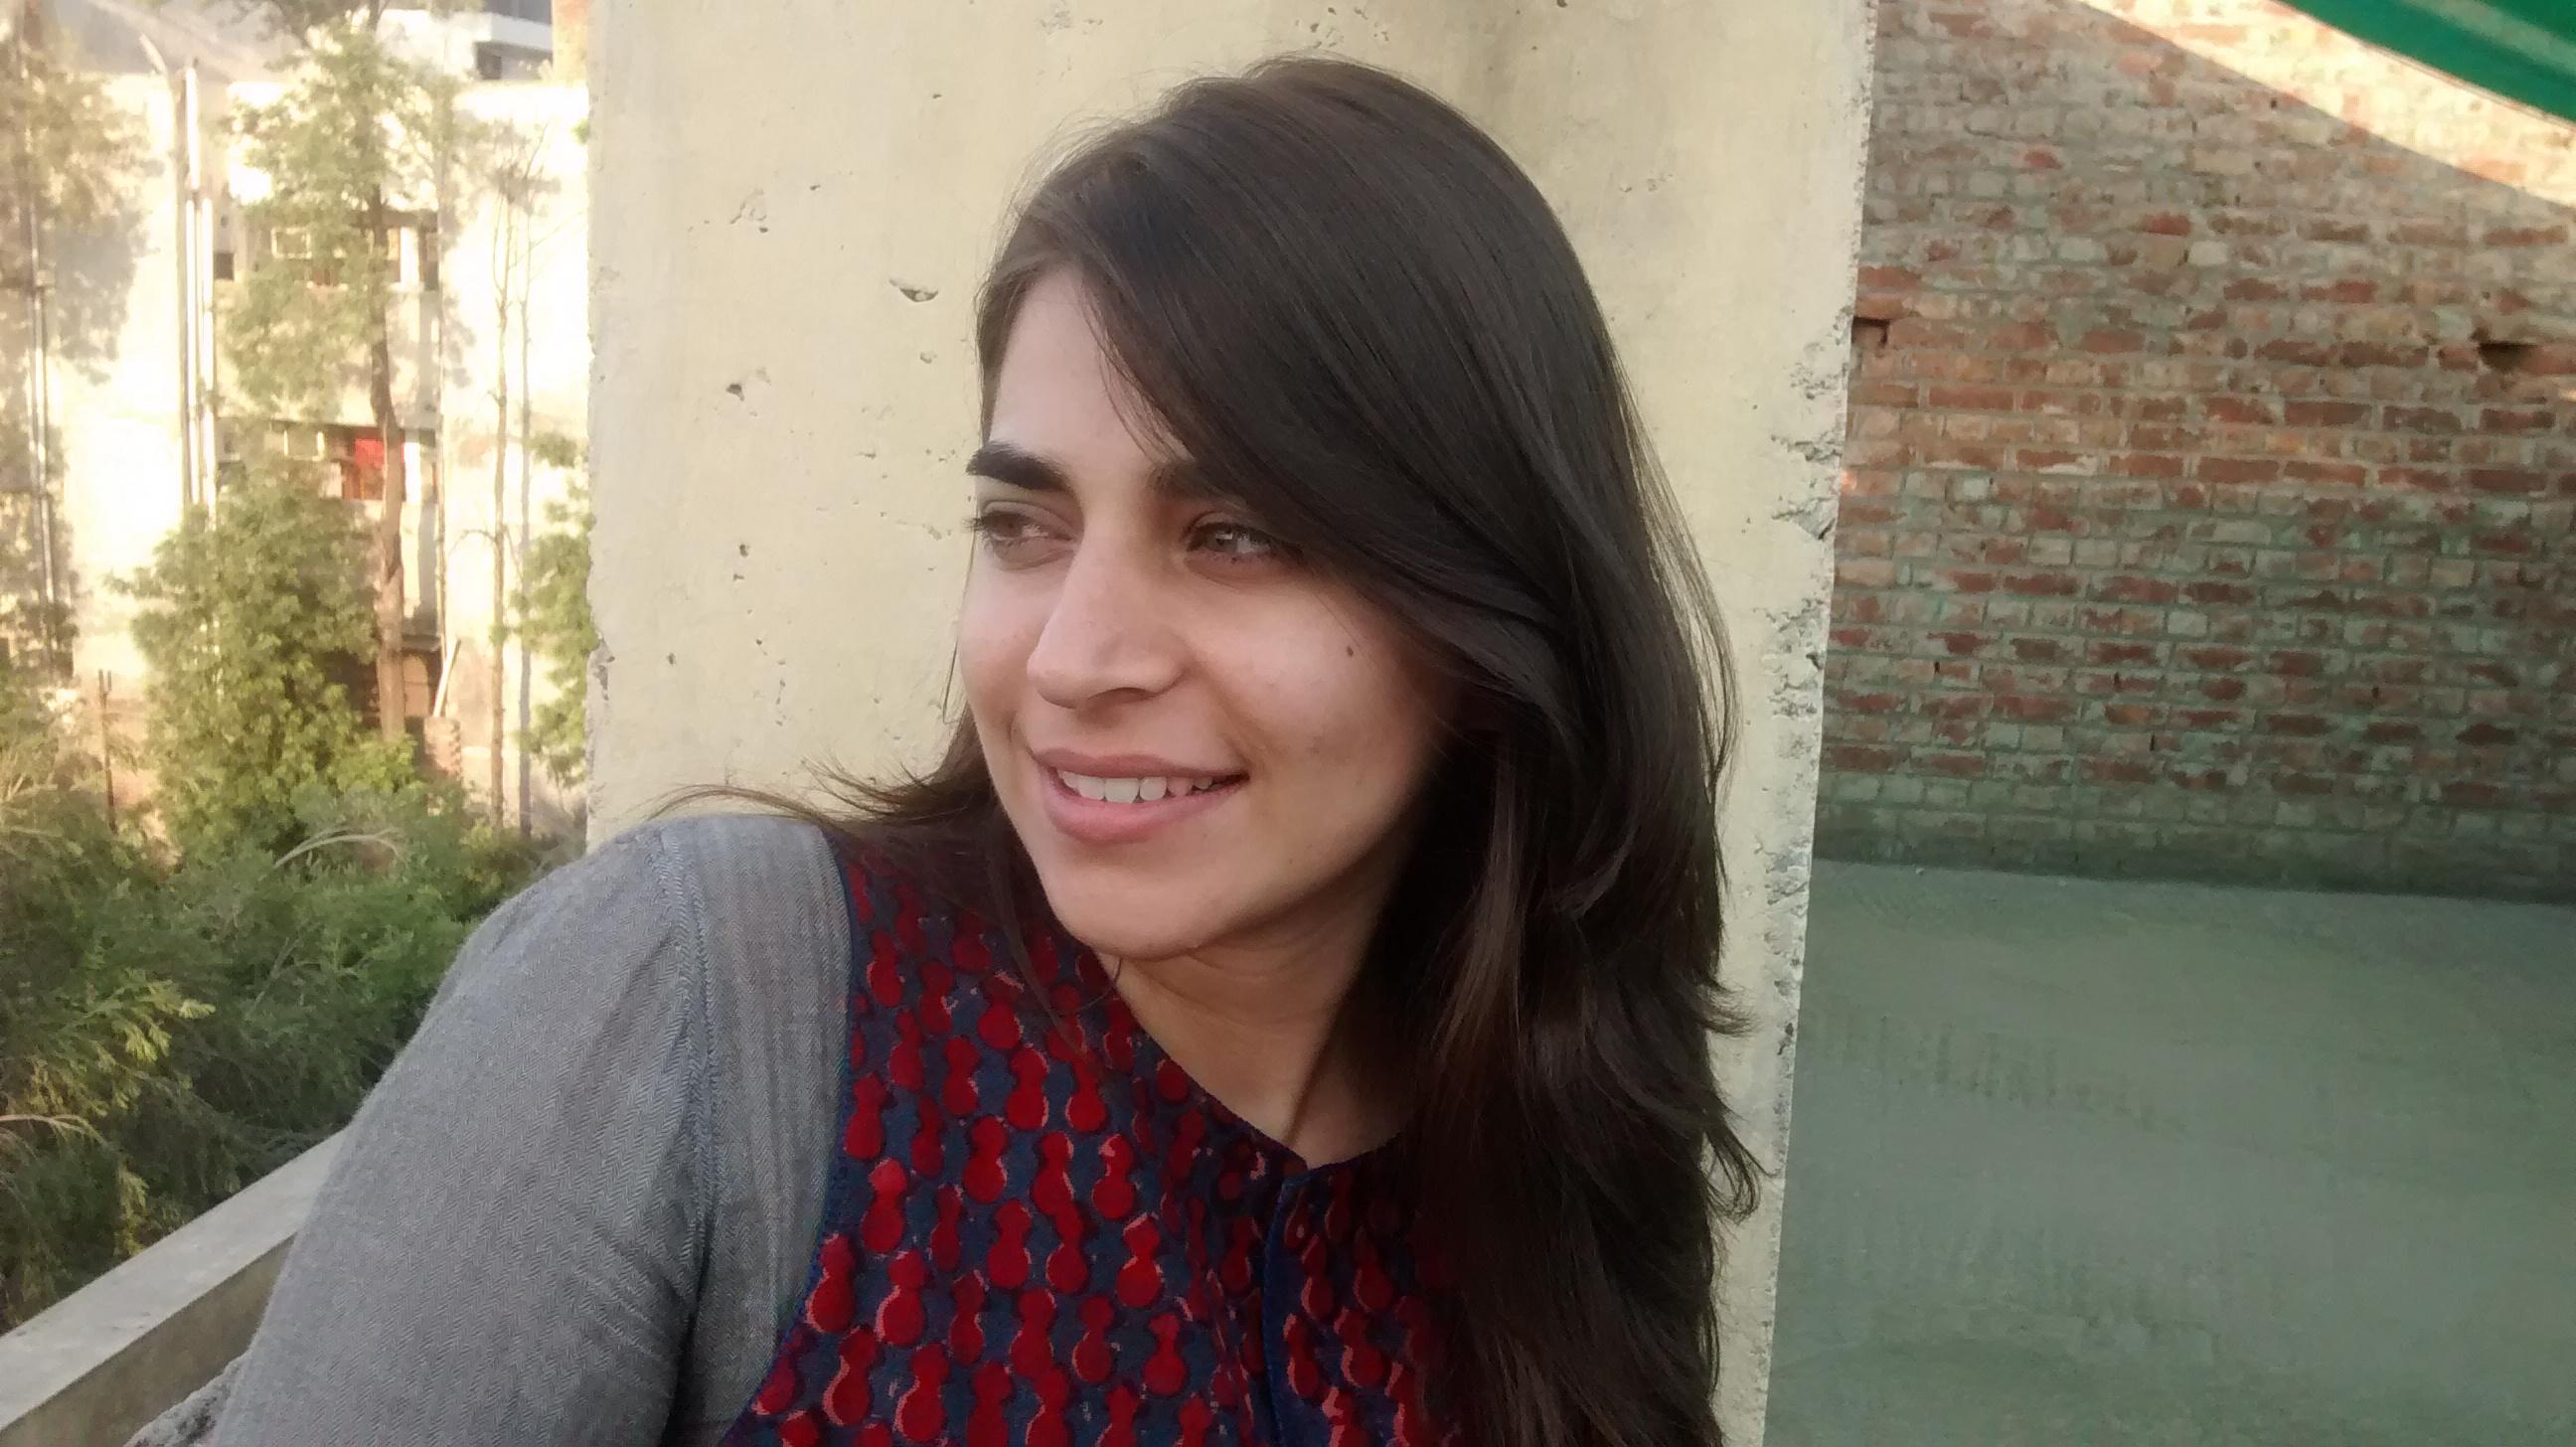 Delhi's Proust Questionnaire – Aditi Bhatia, Saidulajab